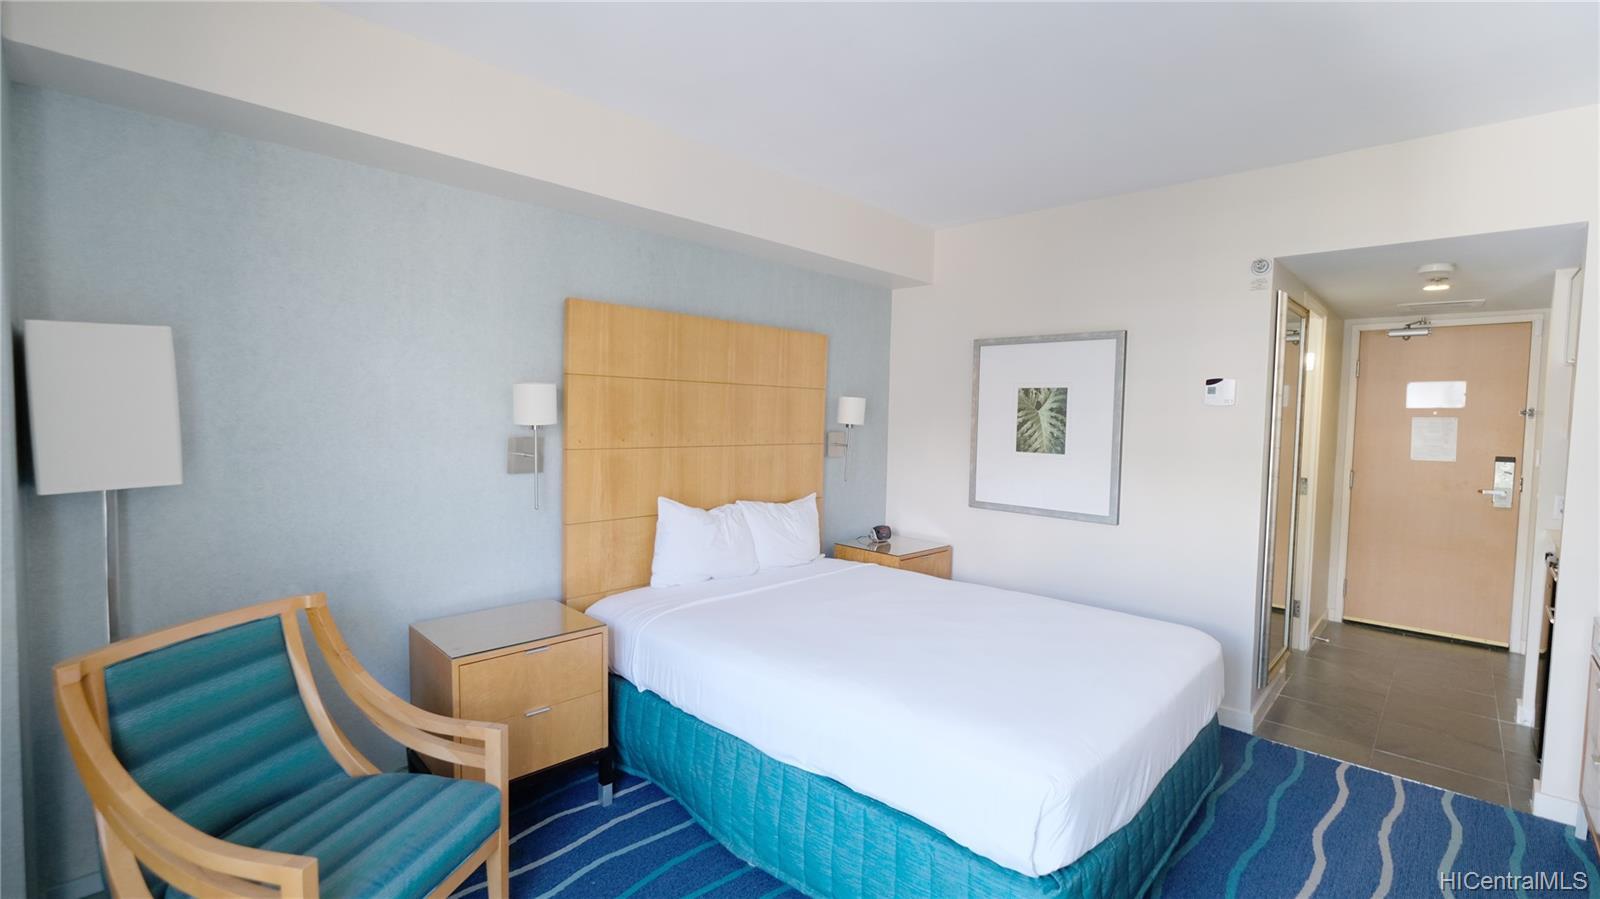 Ala Moana Hotel Condo condo # 1142, Honolulu, Hawaii - photo 3 of 6